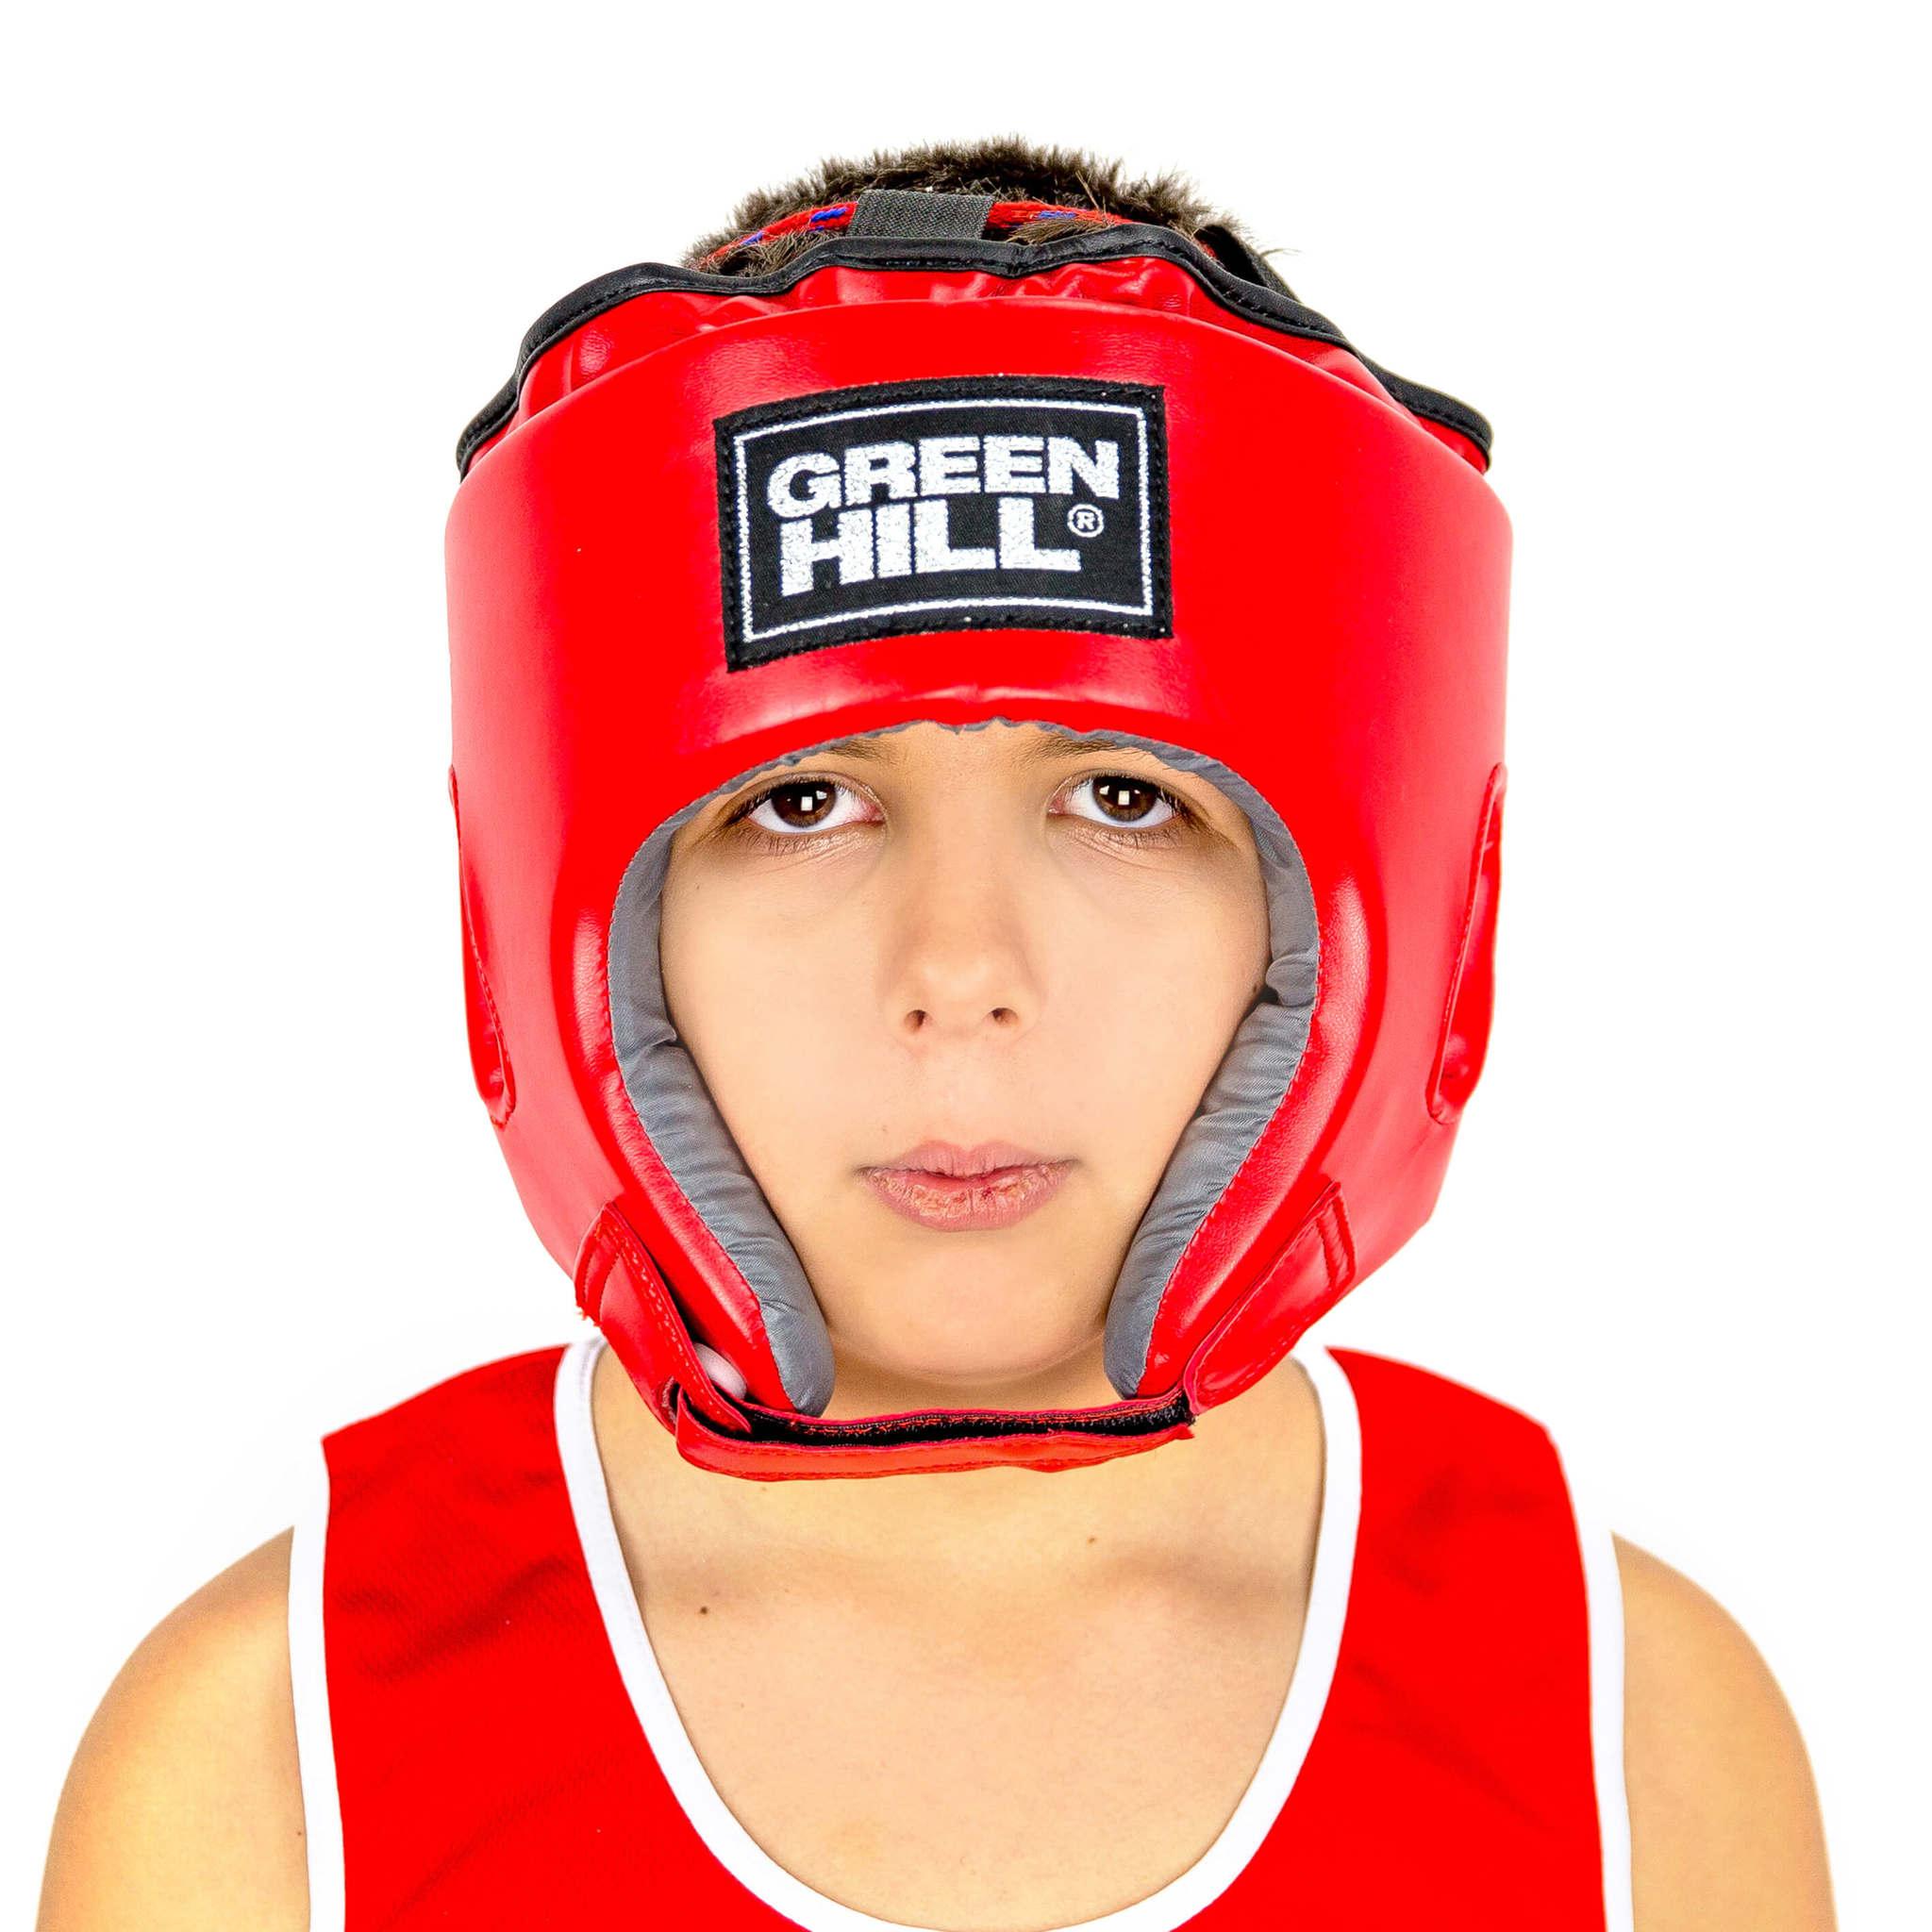 Шлемы Шлем для боевого самбо ORBIT Green Hill 5L9A00485L9A0048_1.jpg